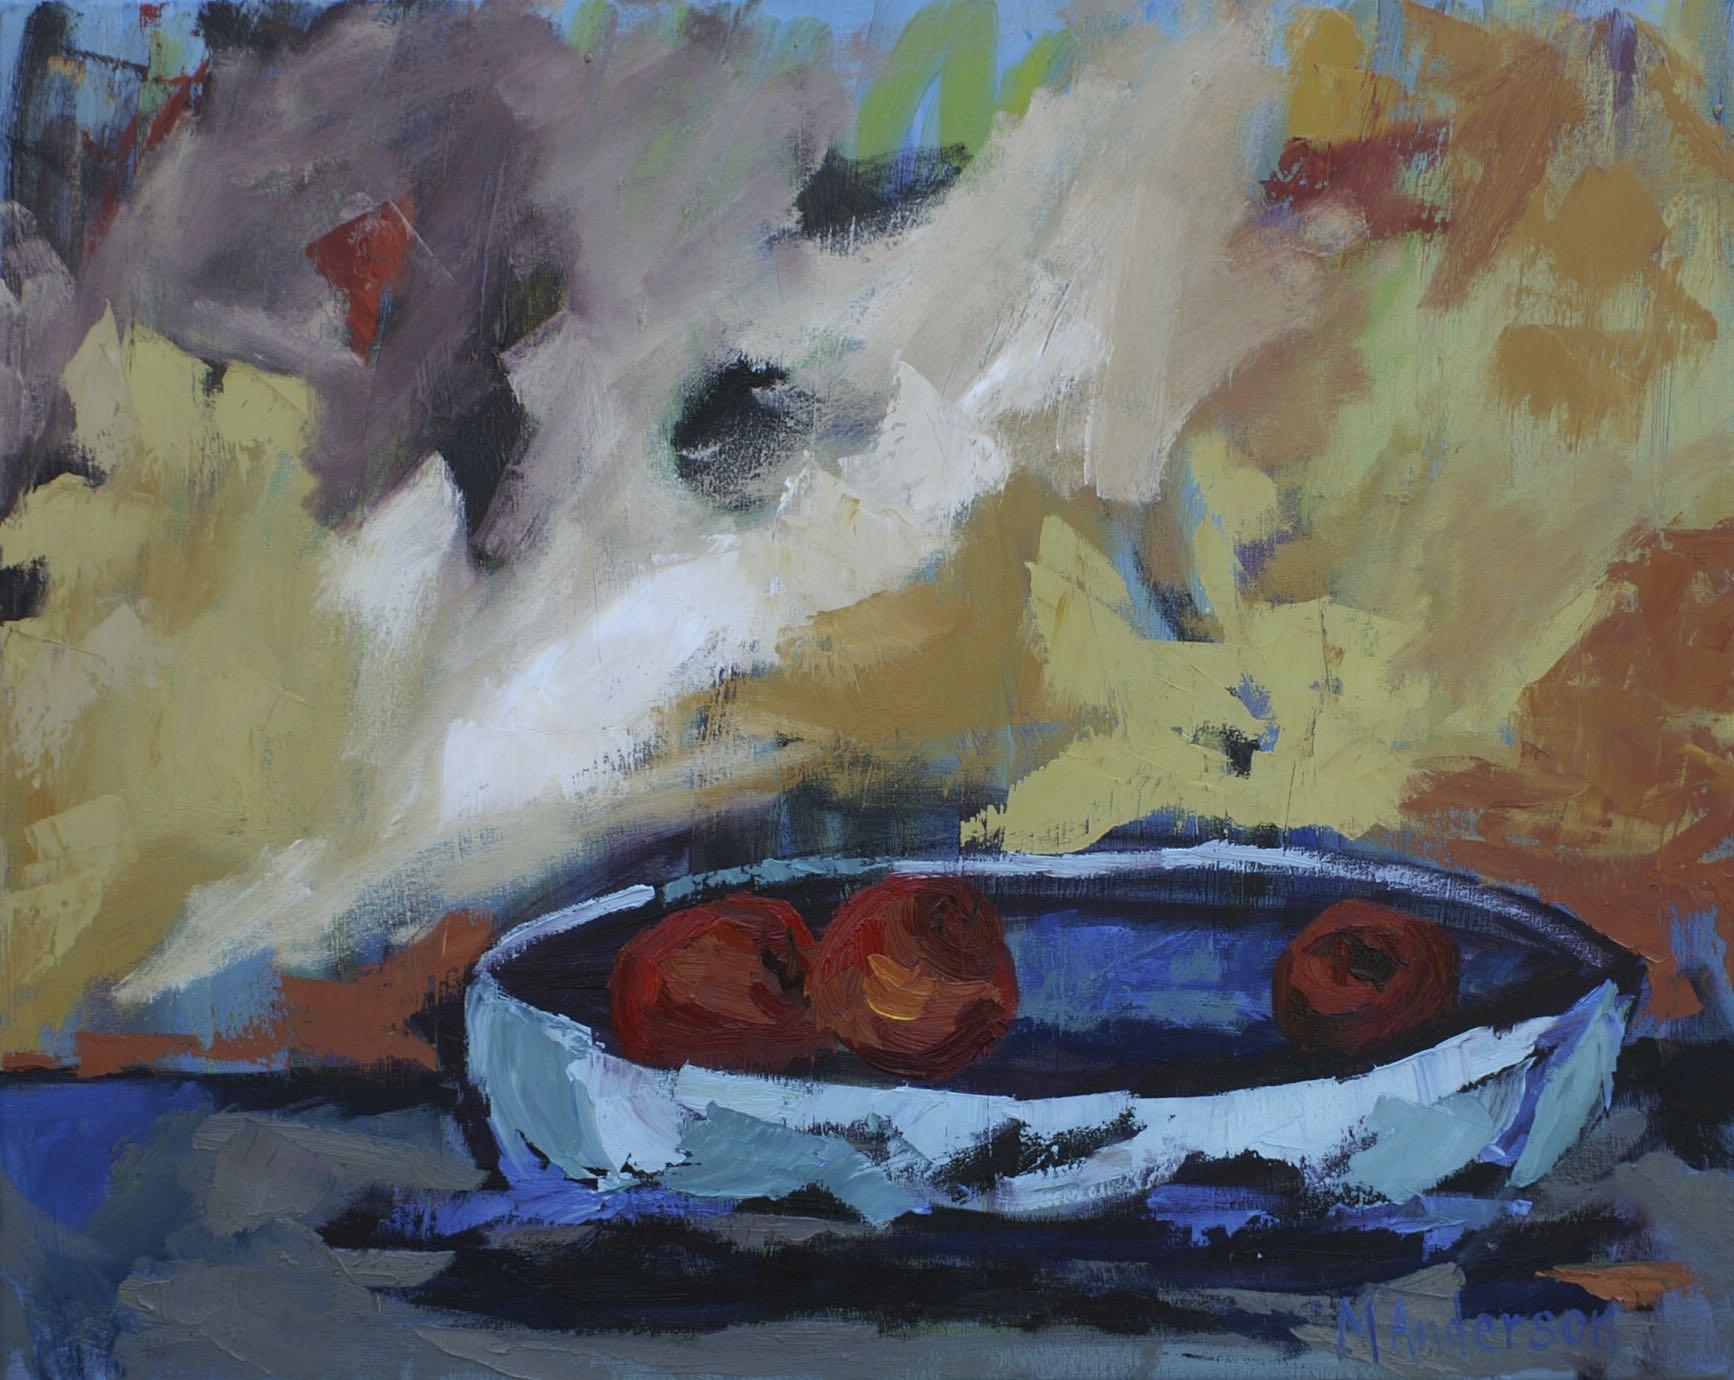 Fruit Bowl (24x30 Canvas) - Sold